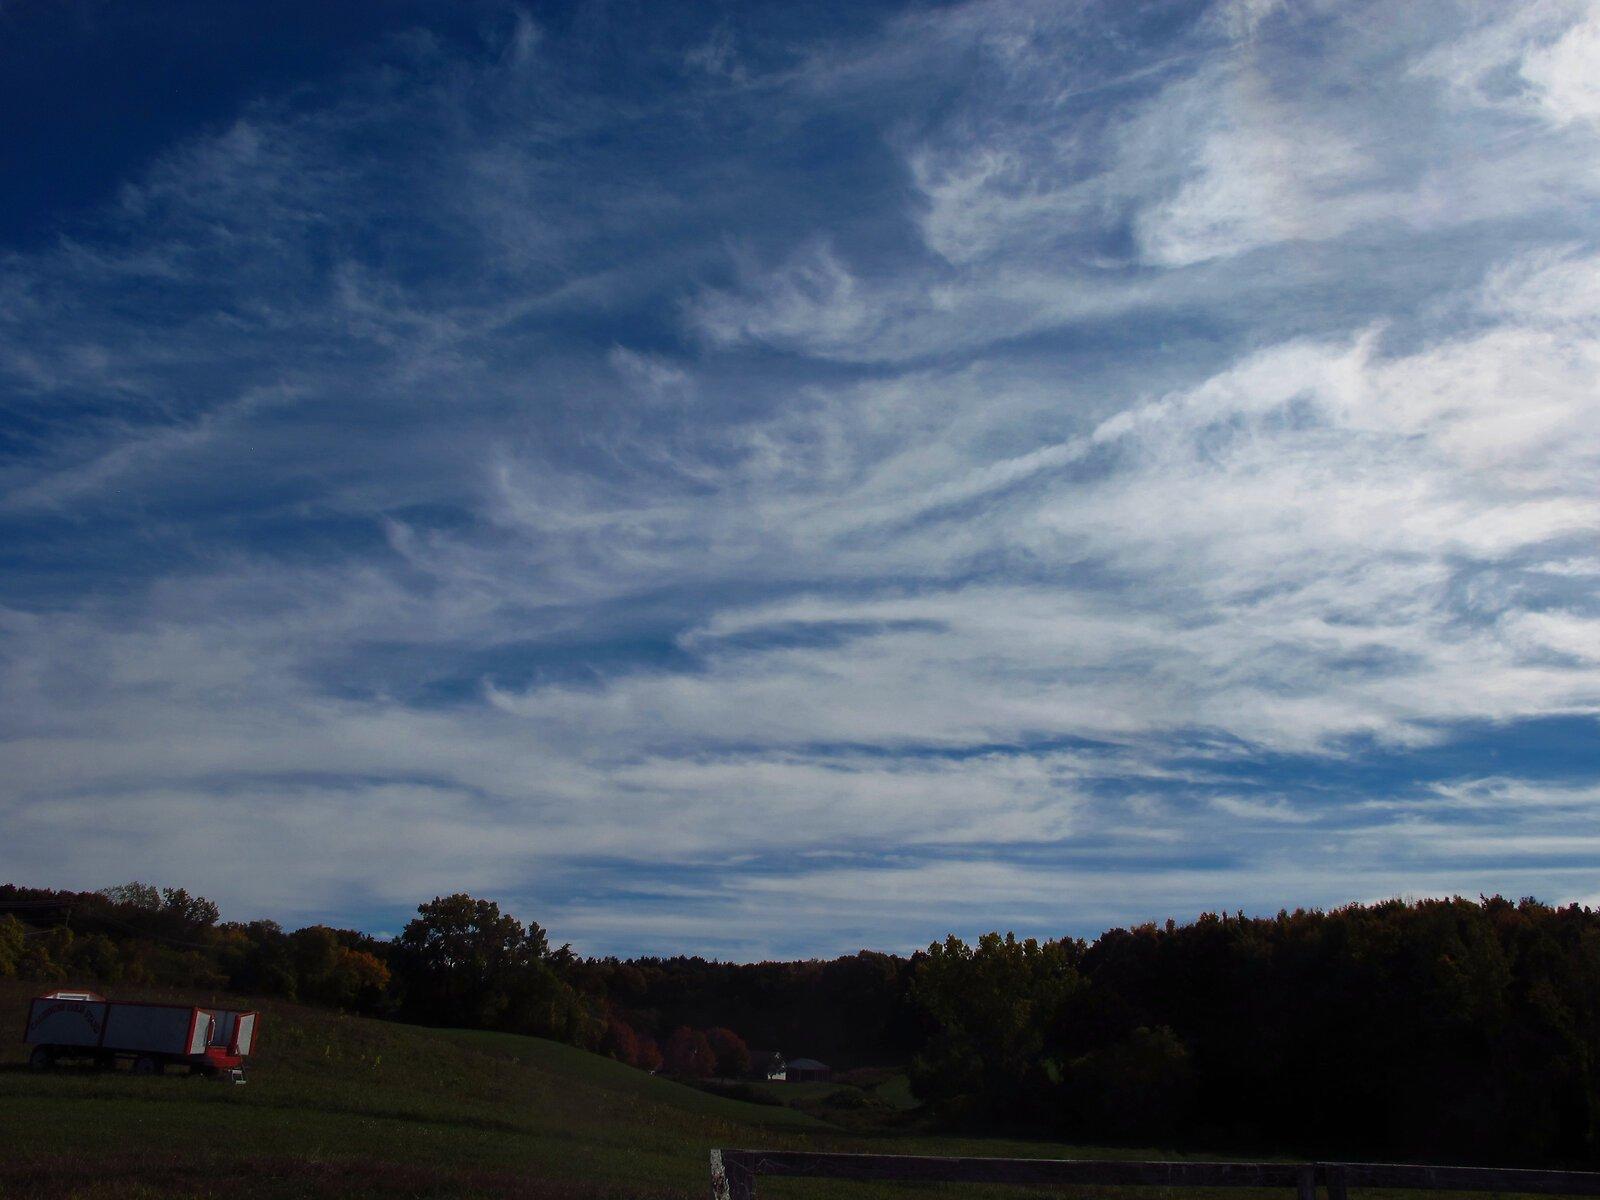 G12 skies Frear Park leaves 015 B.jpg